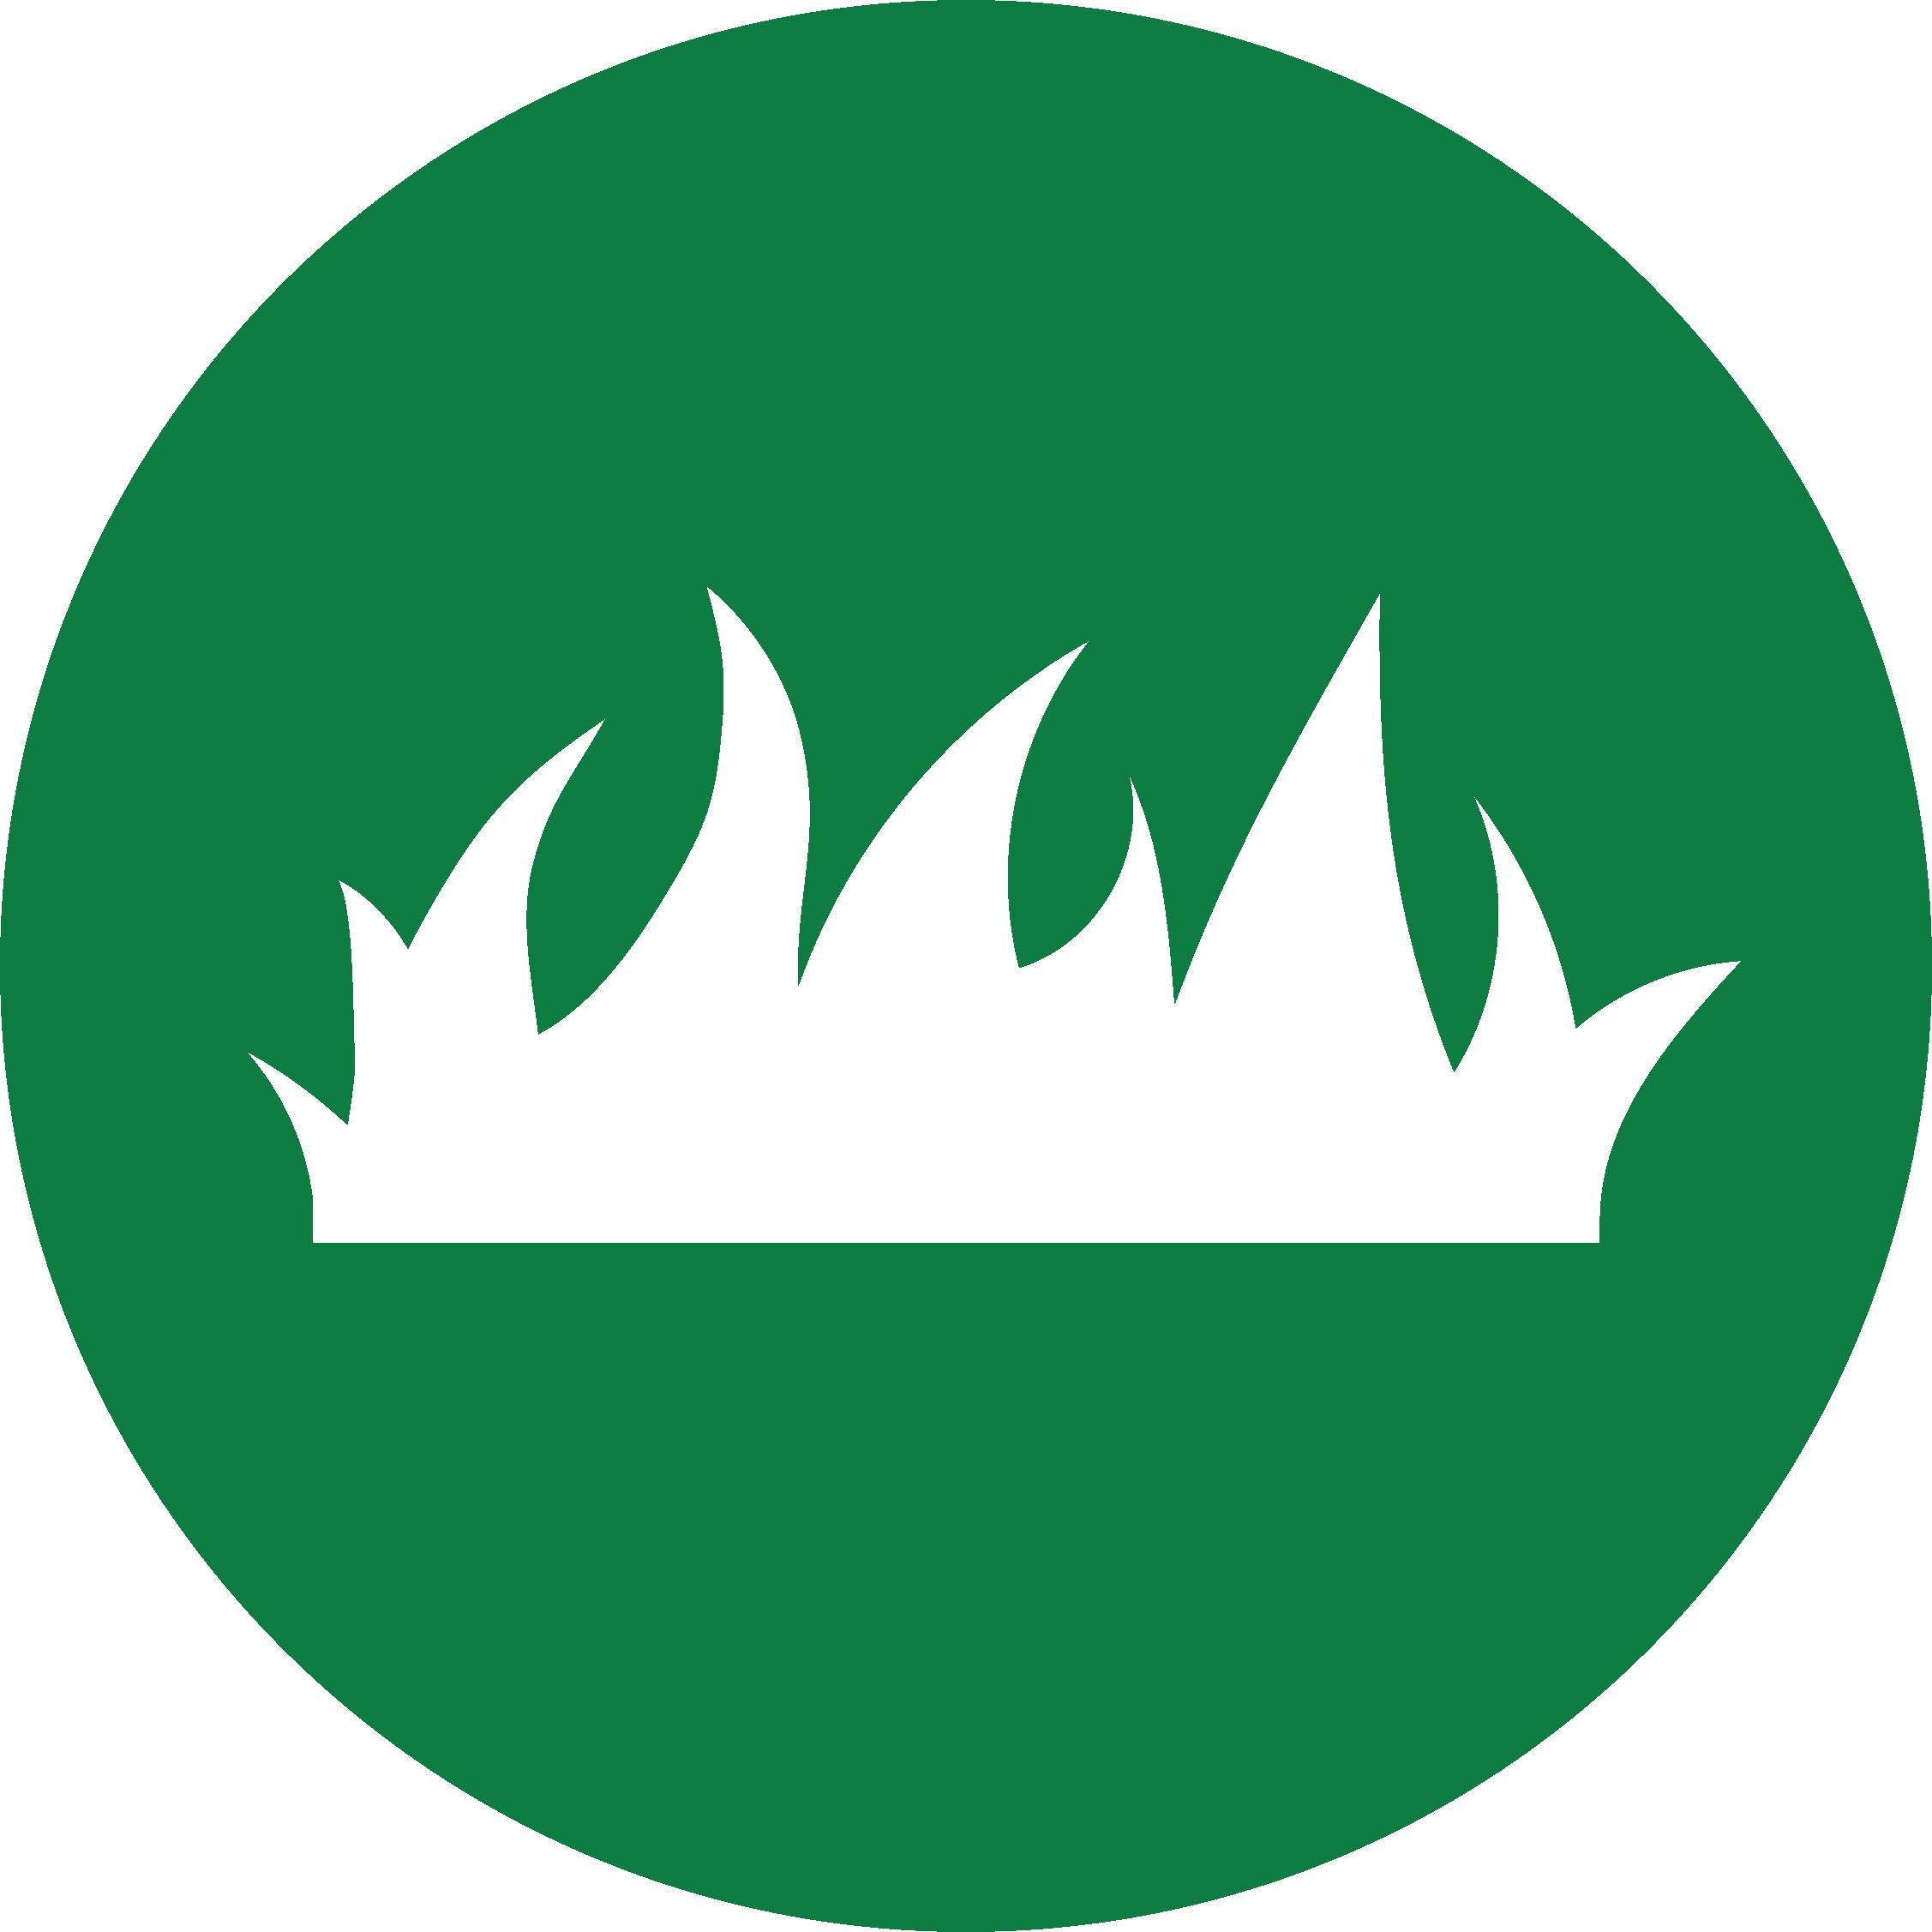 custom lawn care icon green